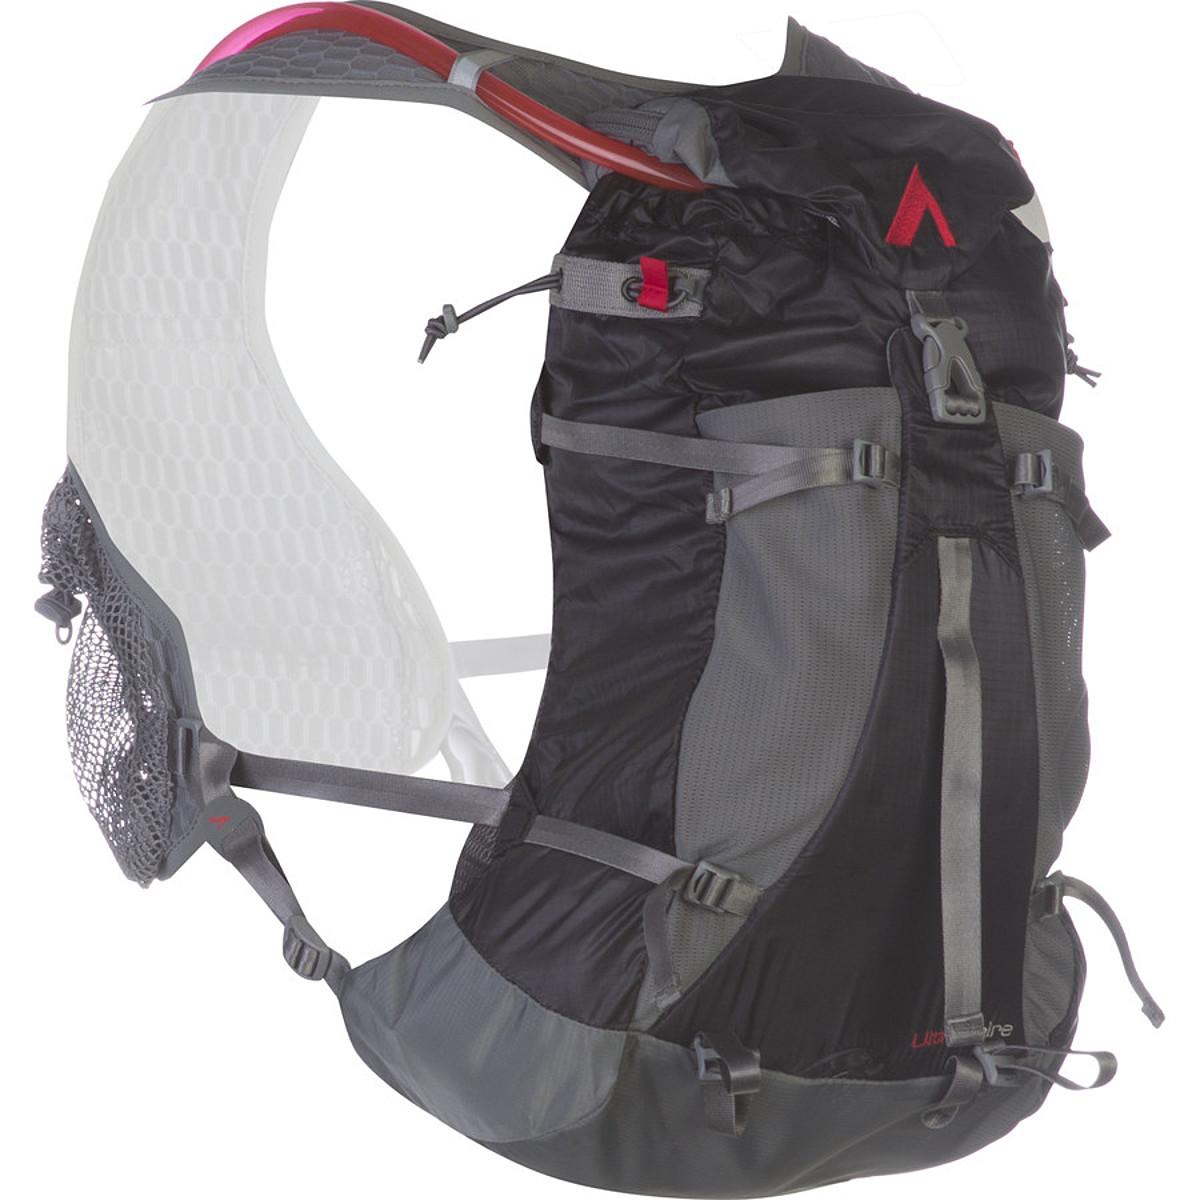 UltrAspire Titan 2.0 Hydration Vest